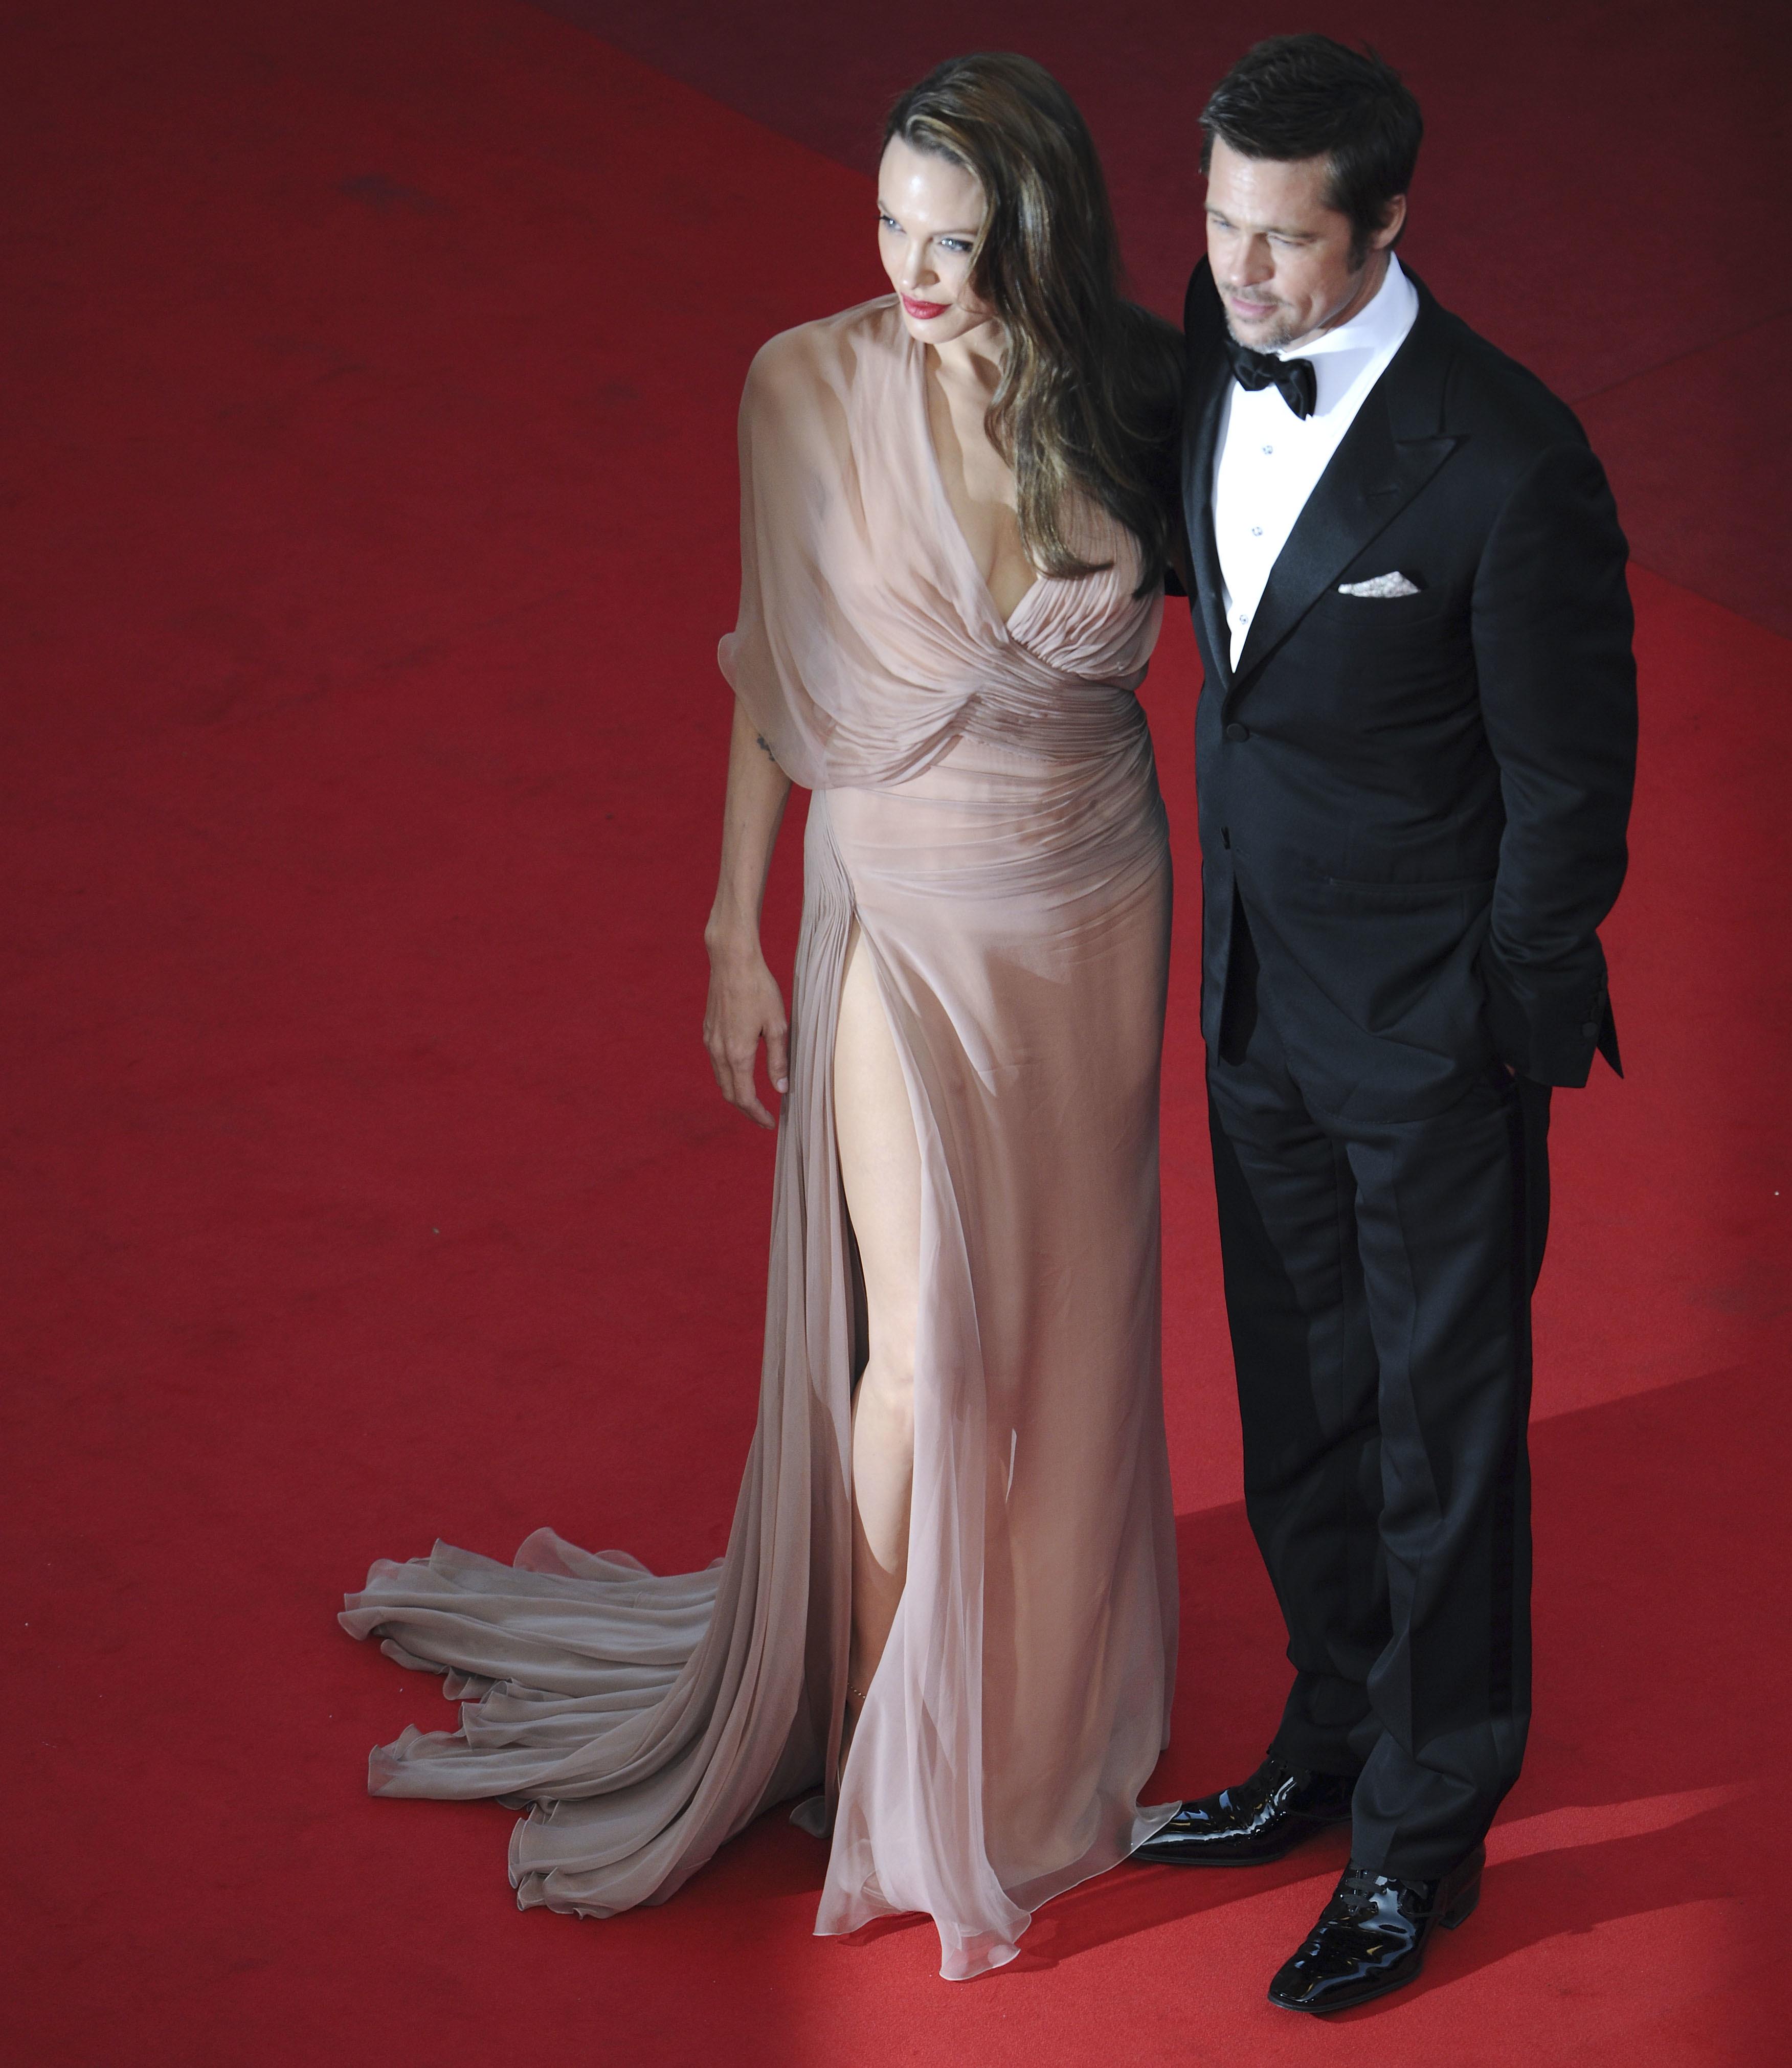 090520018798 Brad Pitt and Angelina Jolie